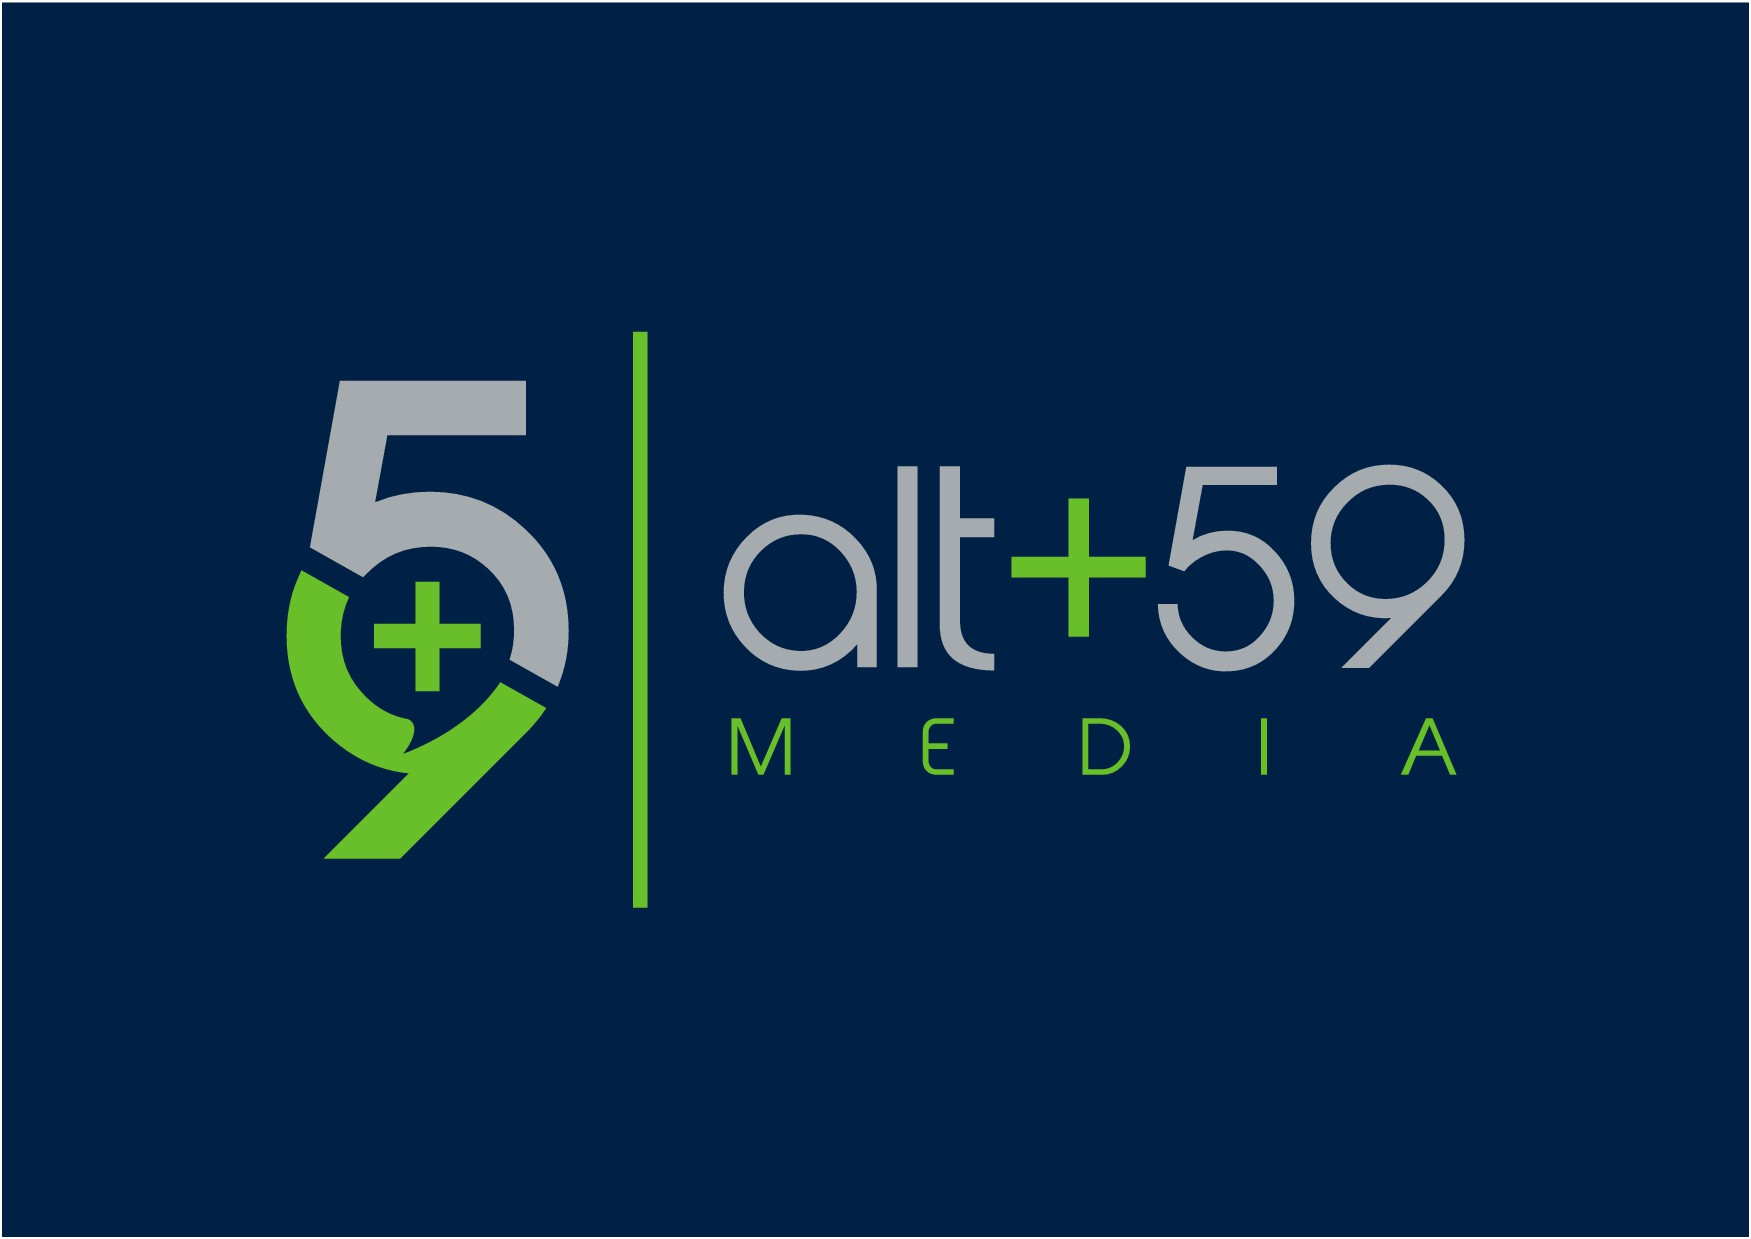 Design a modern logo for a web development company